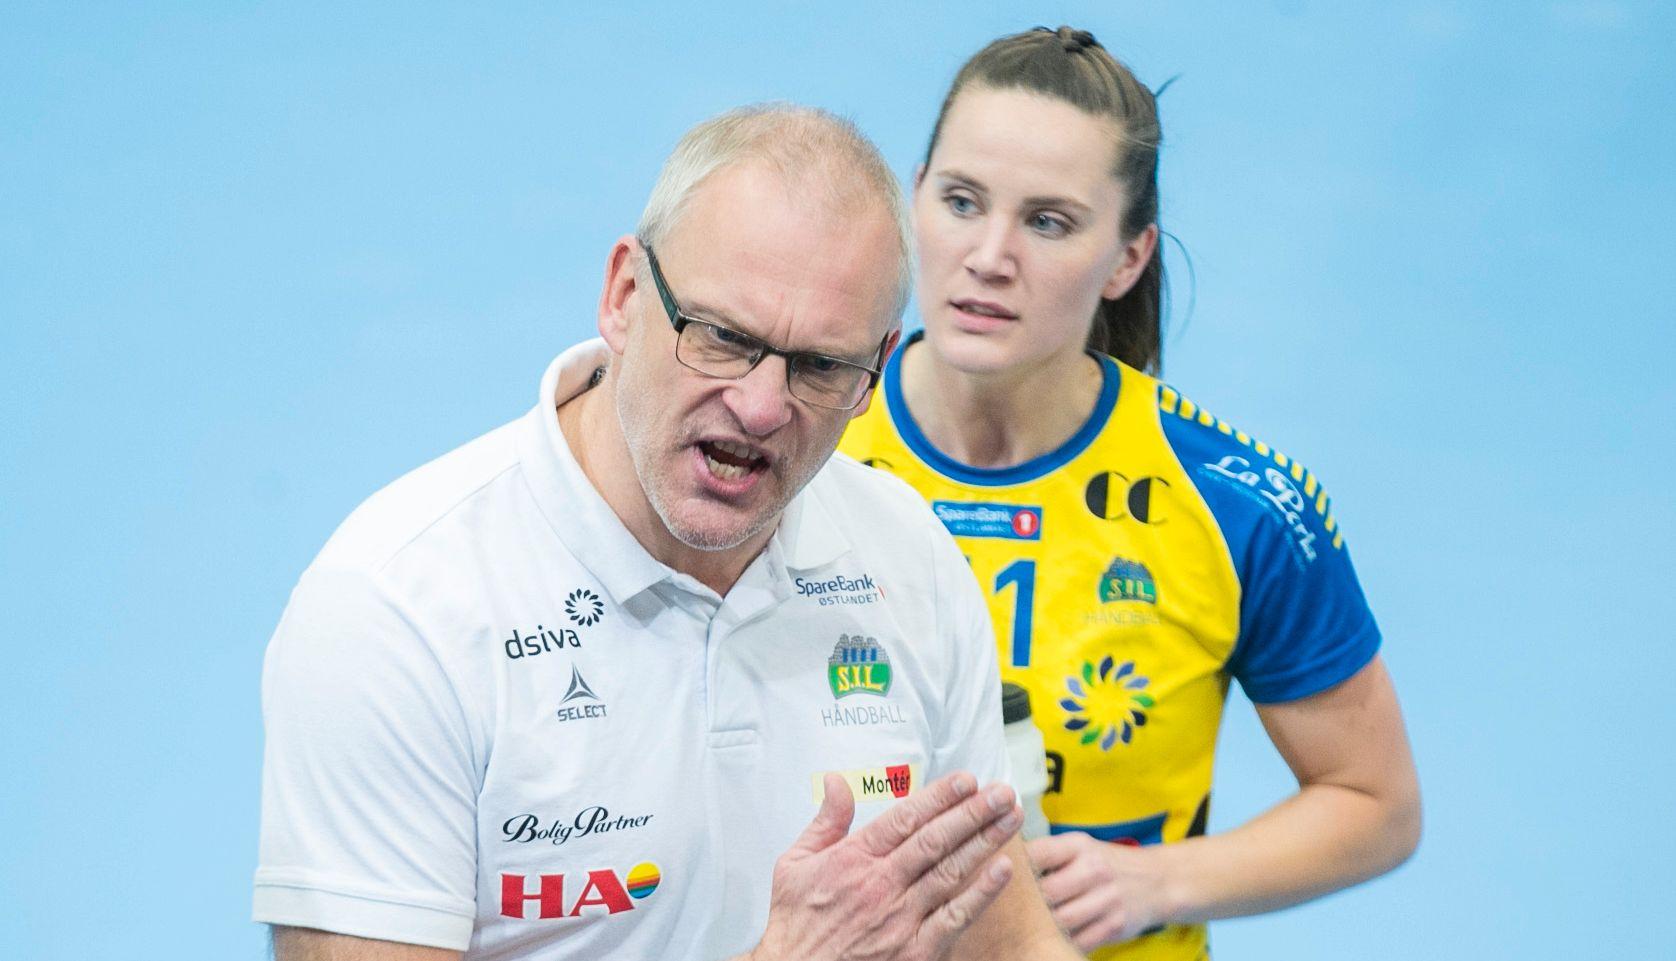 TIL POLEN: Alt tyder på at Arne Senstad blir polsk landslagssjef. Her som Storhamar-trener med landslagsaktuelle Tonje Enkerud bak.